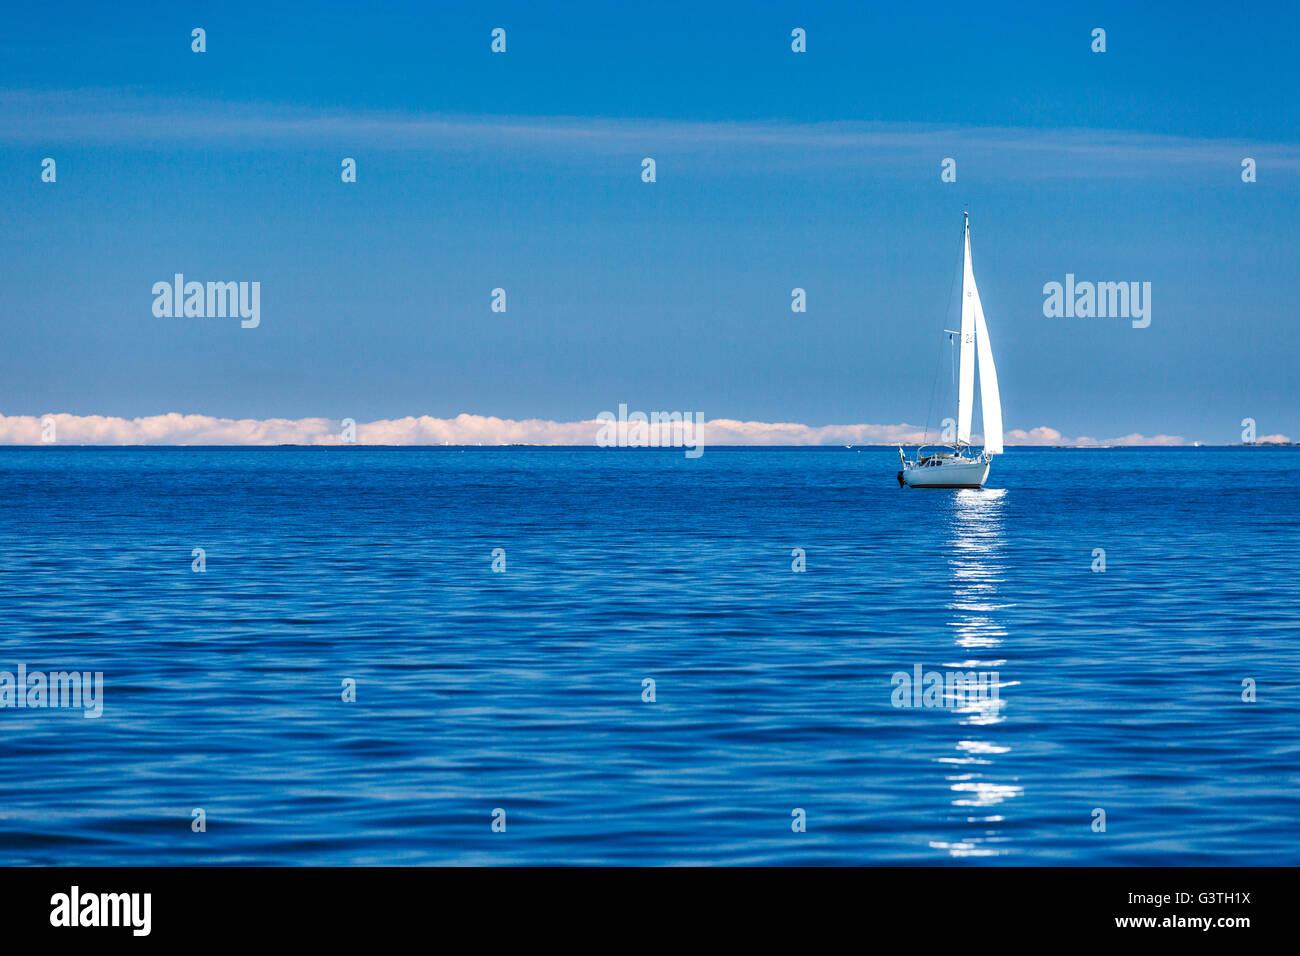 Sweden, Uppland, Stockholm Archipelago, Boat sailing in full sea - Stock Image